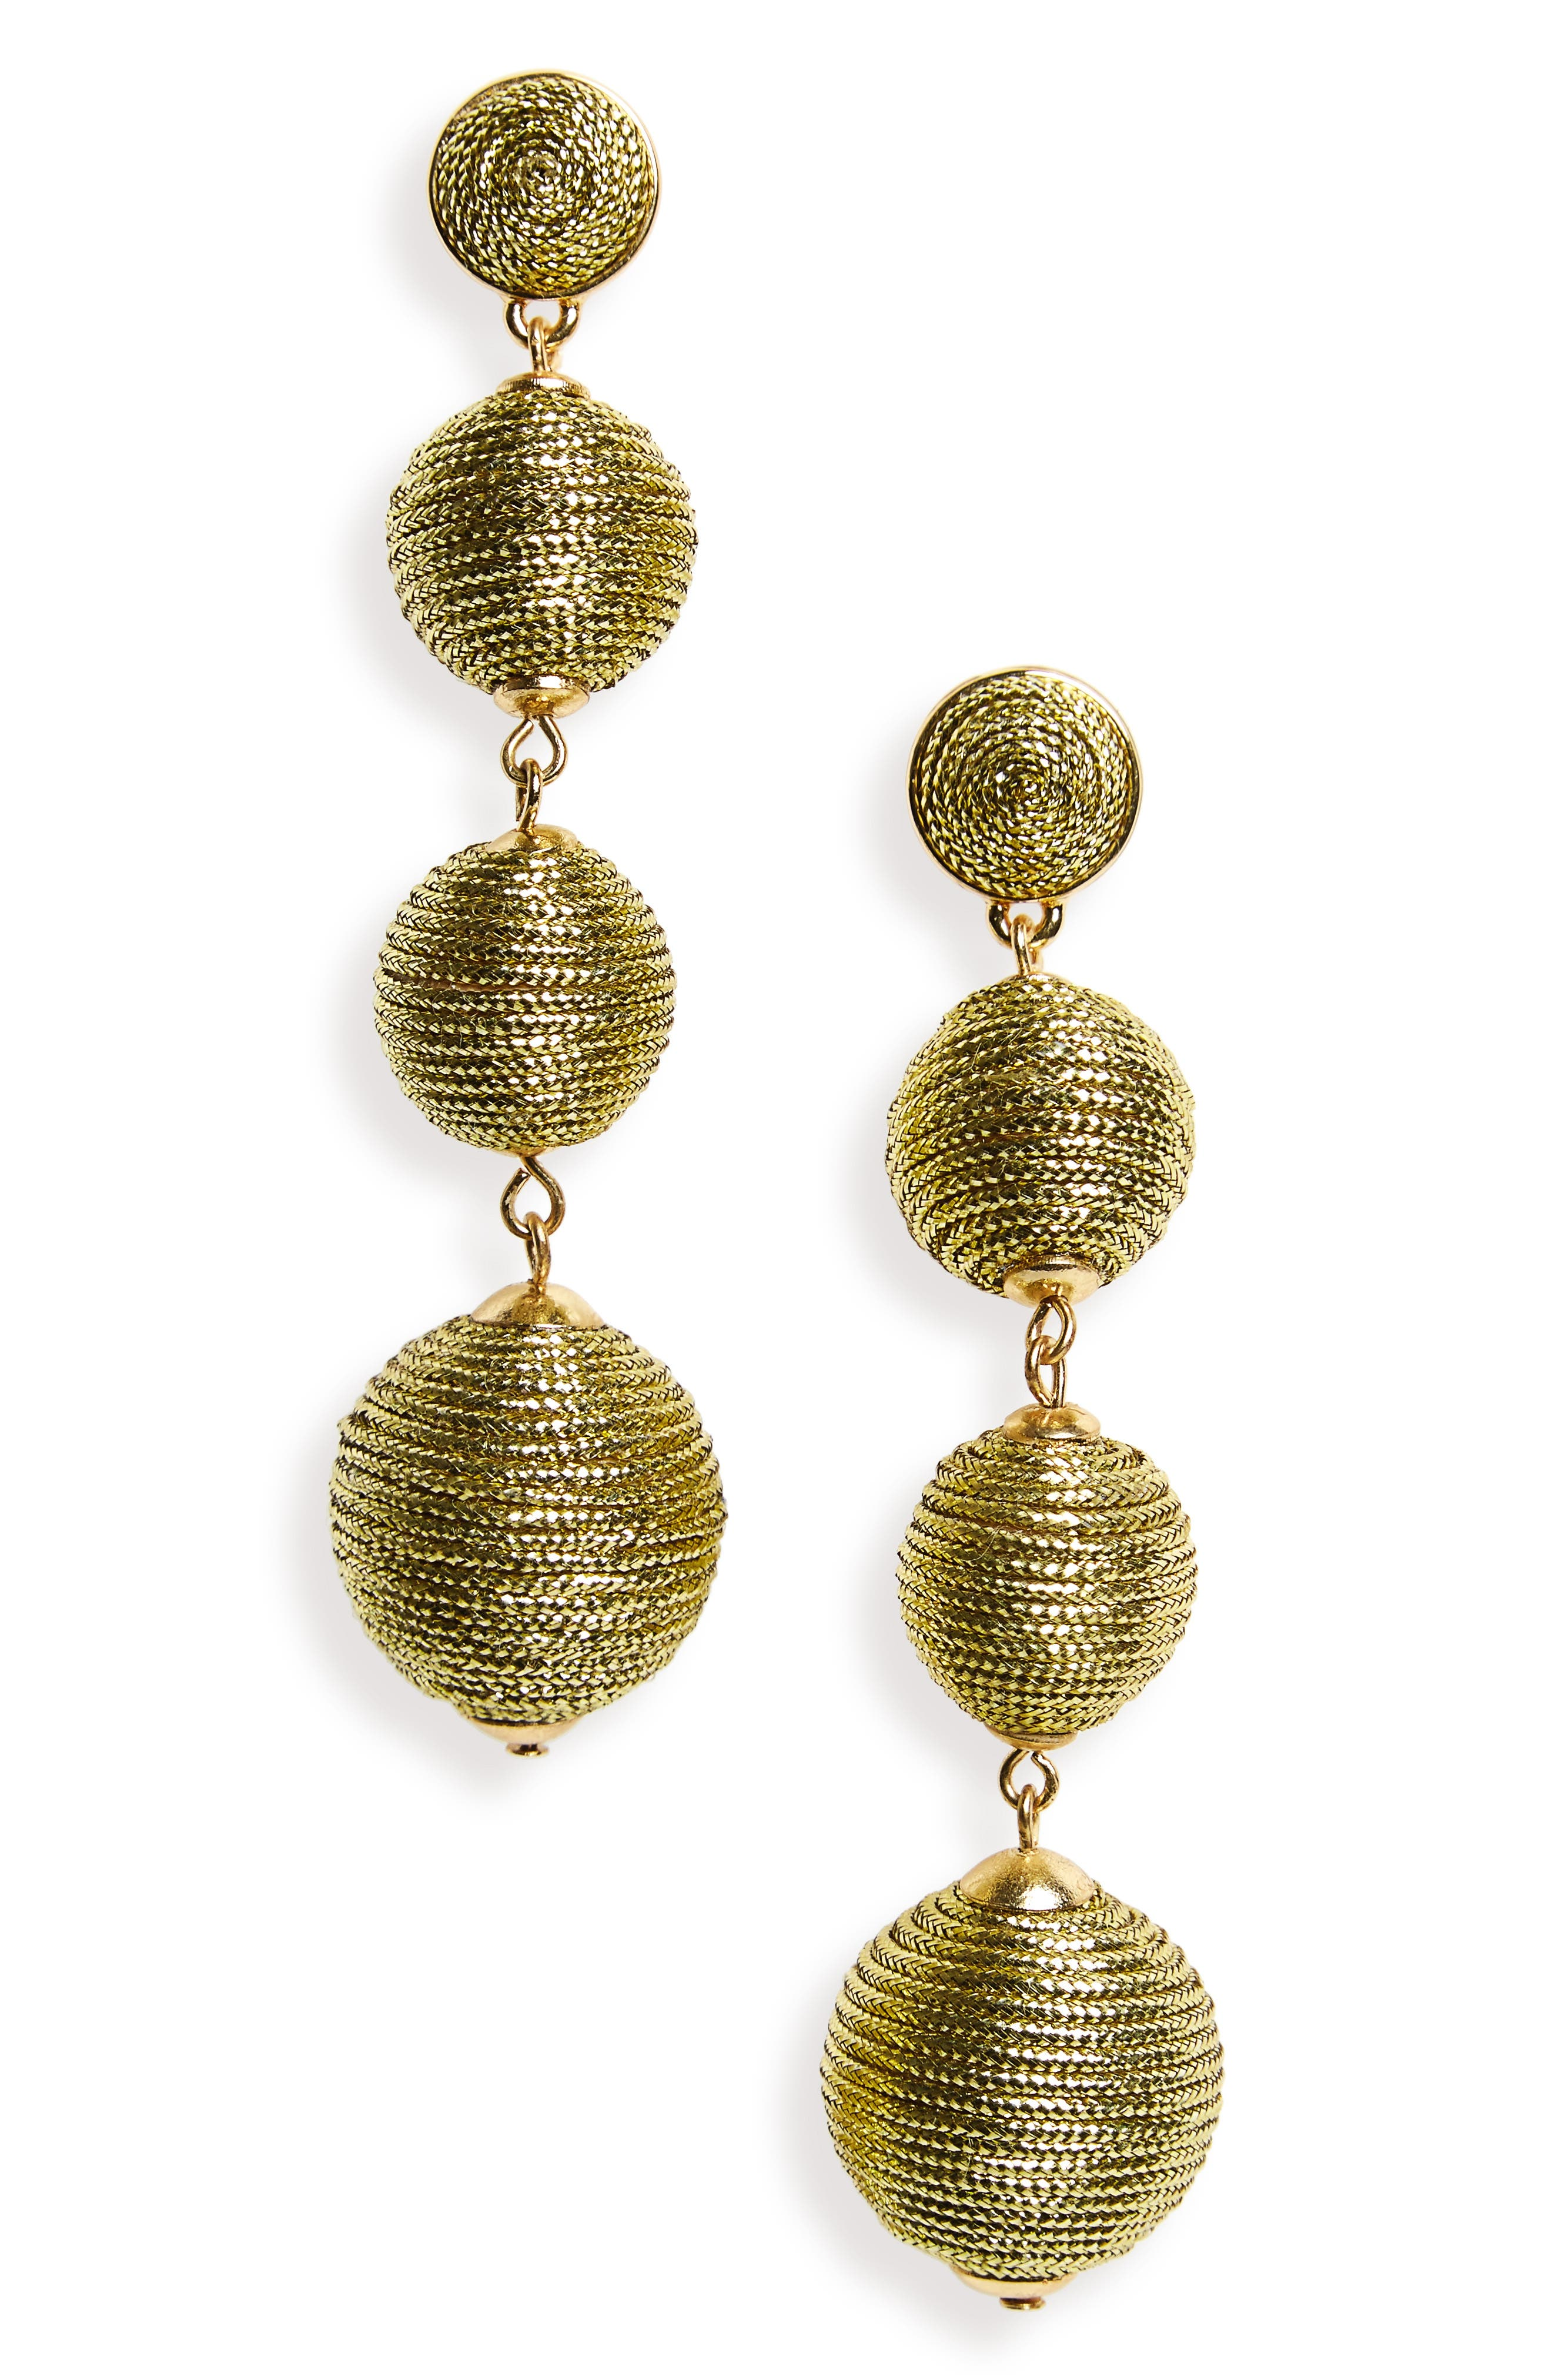 Criselda Ball Shoulder Duster Earrings,                             Main thumbnail 10, color,